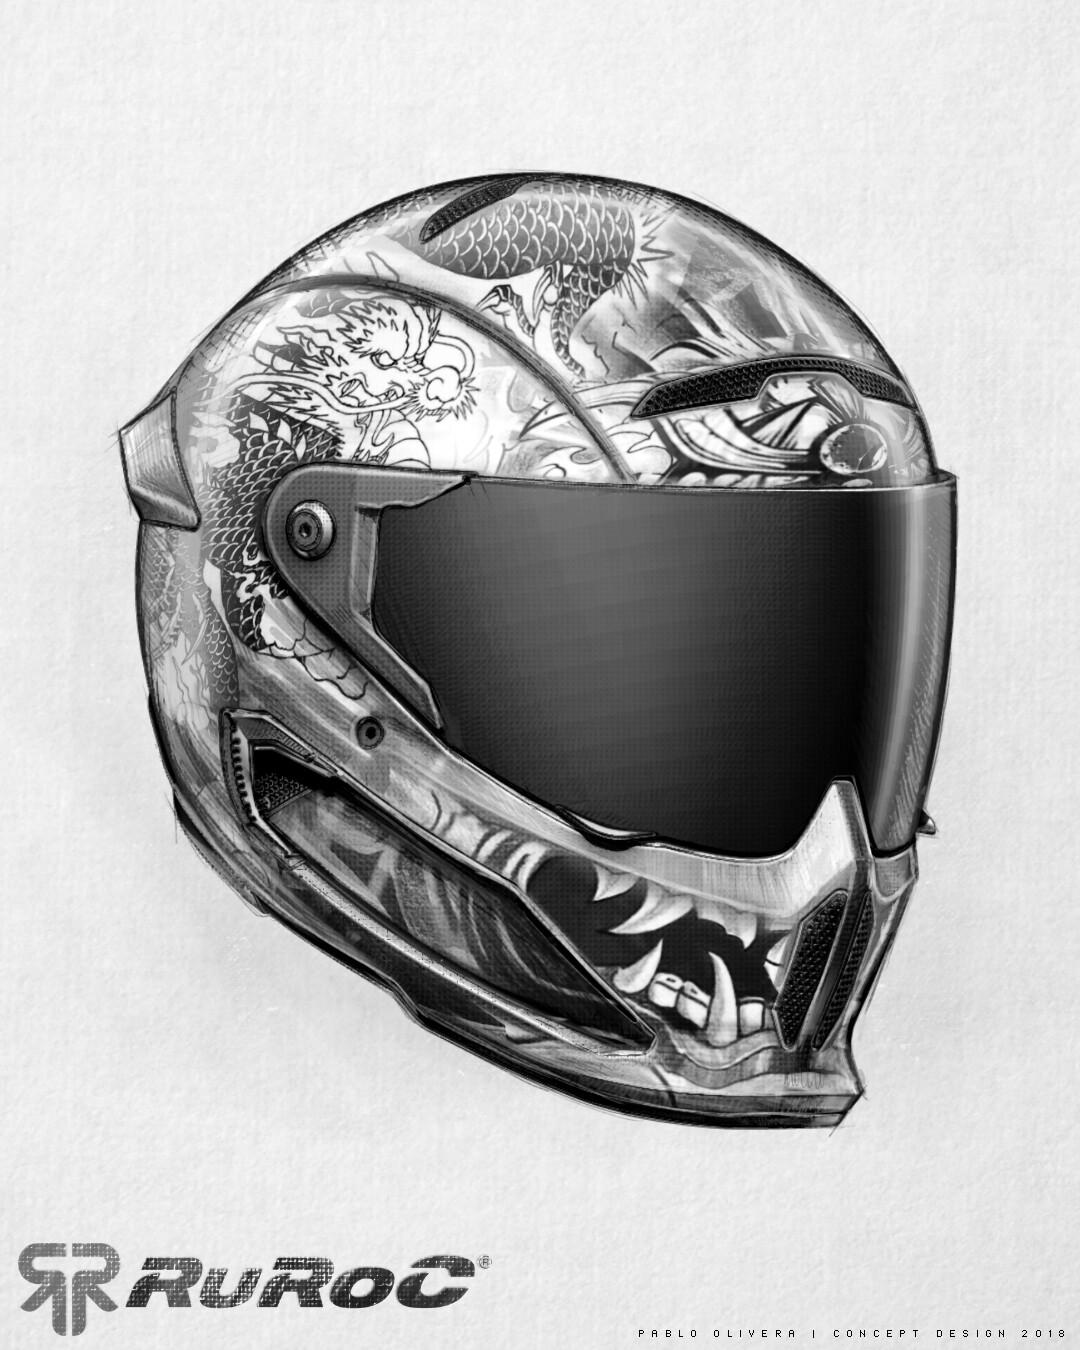 Pablo olivera helmet ruroc limited edition drawing sketch atlas 02